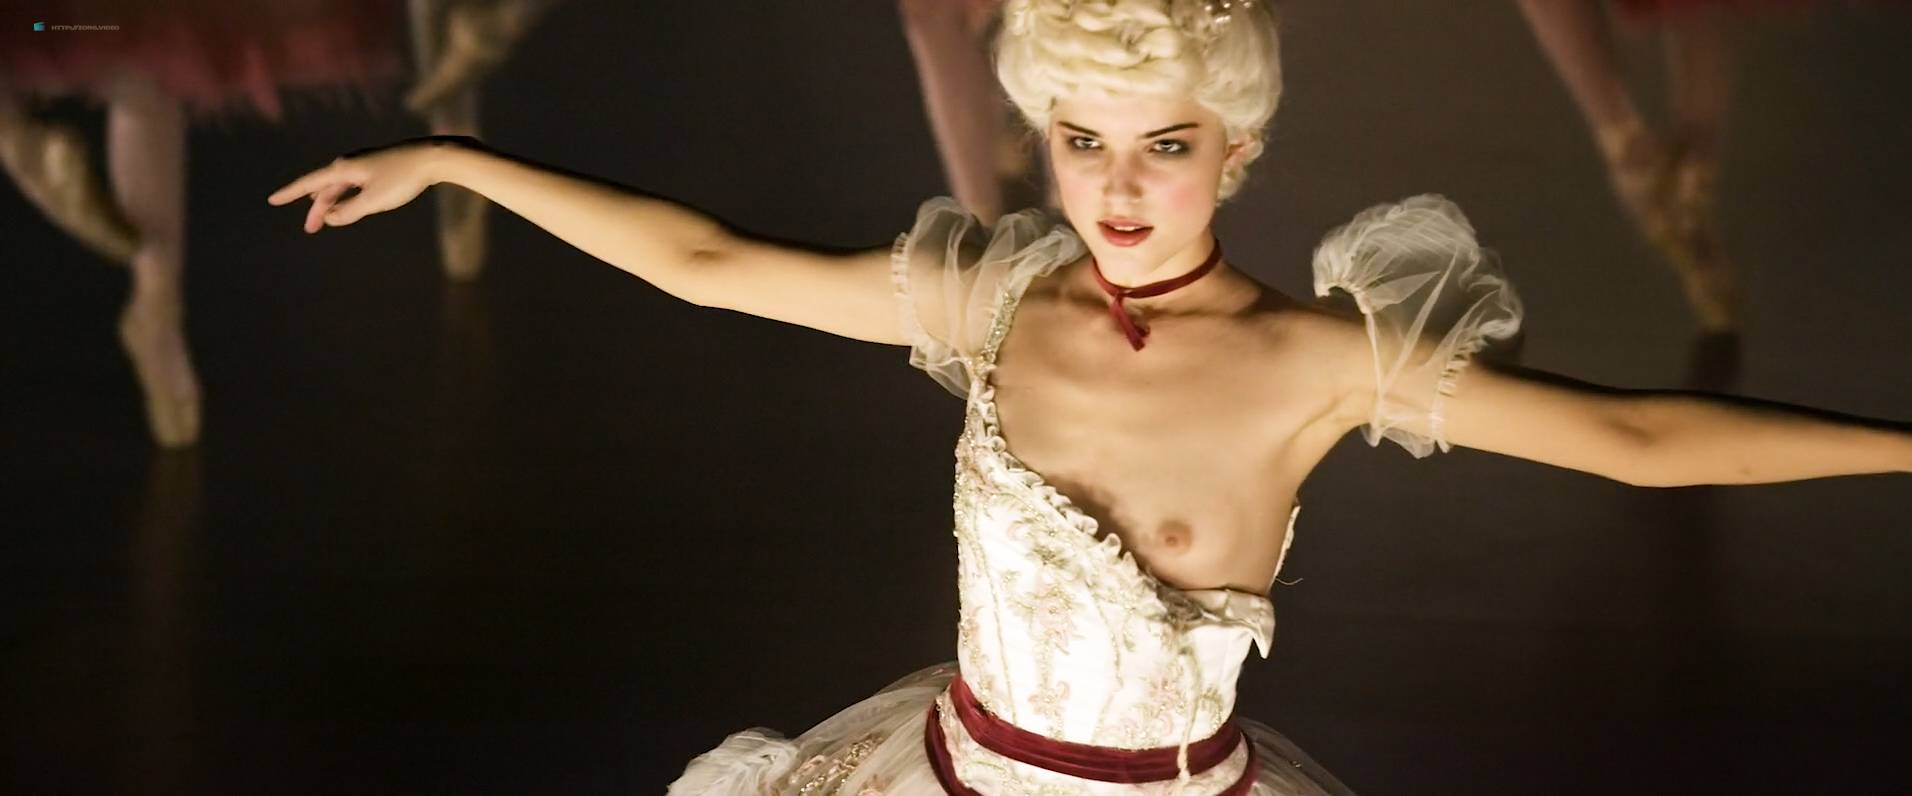 Michalina-Olszanska-nude-topless-Matilda-RU-2017-HD-1080p-WEb-001.jpg